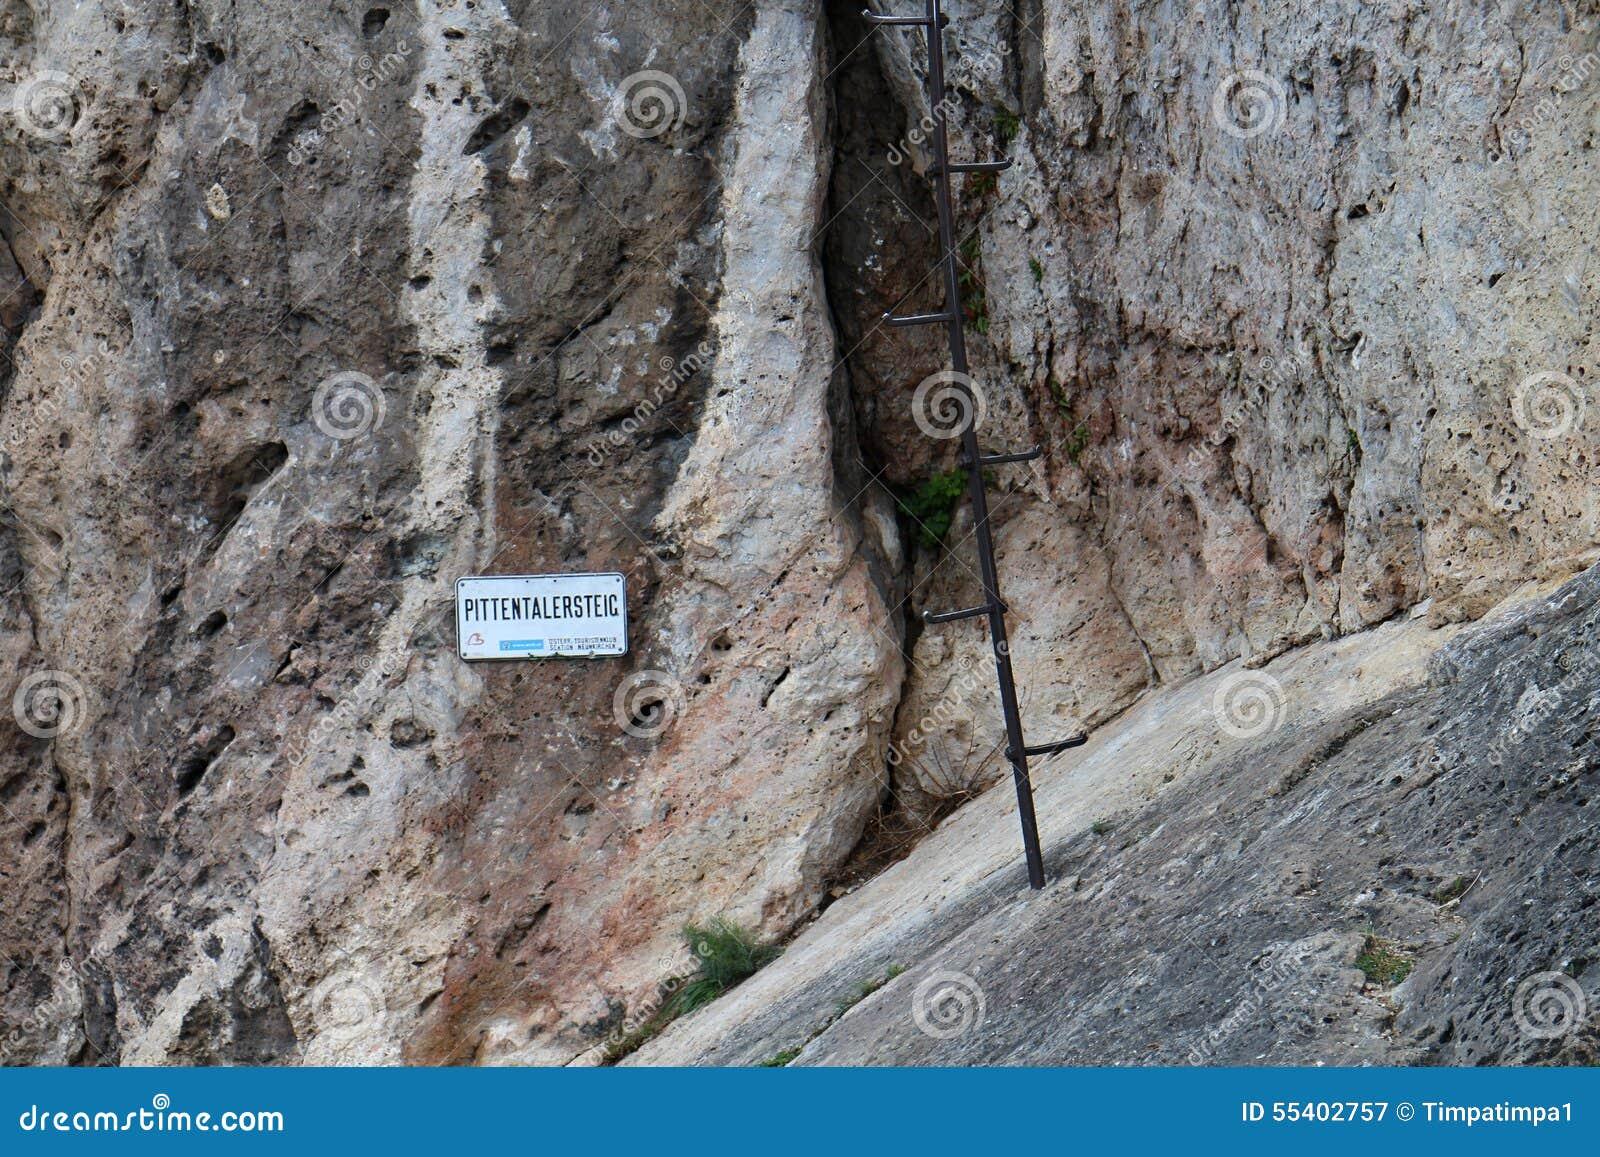 Pittentaler Klettersteig : Start of pittentaler klettersteig with ladder stock image